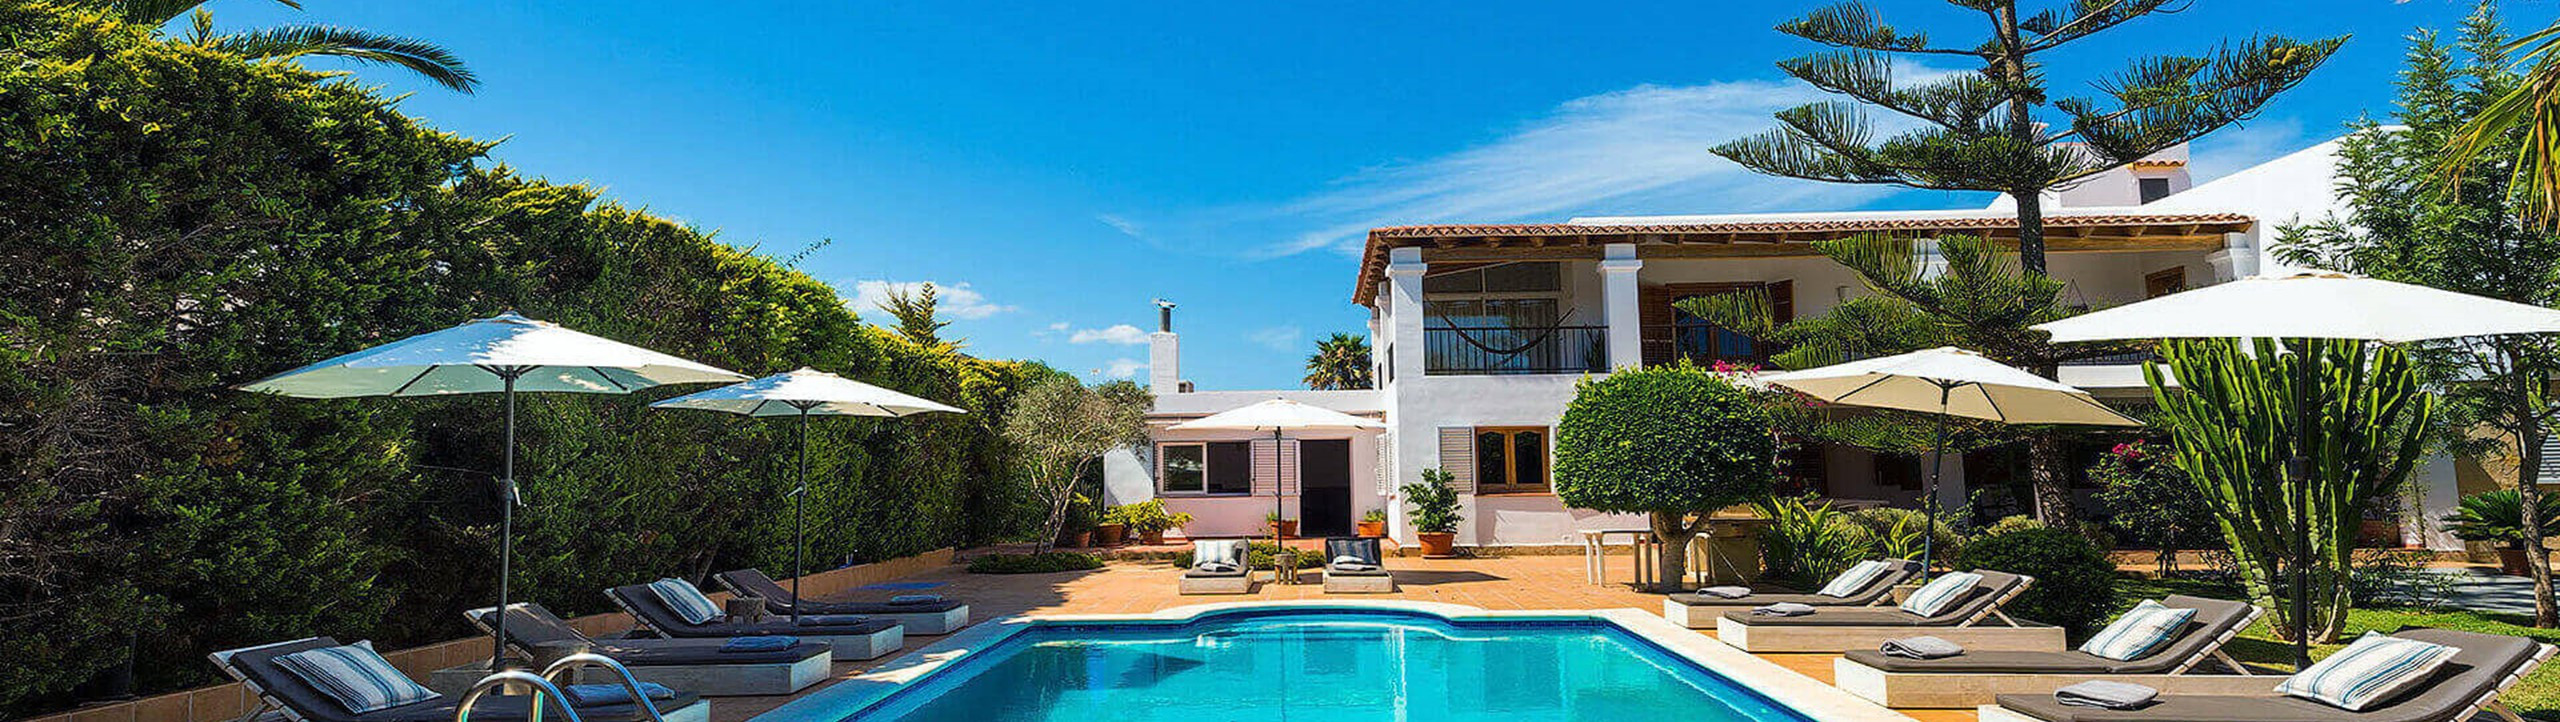 Villa Azul Ibiza 1 San Jordi